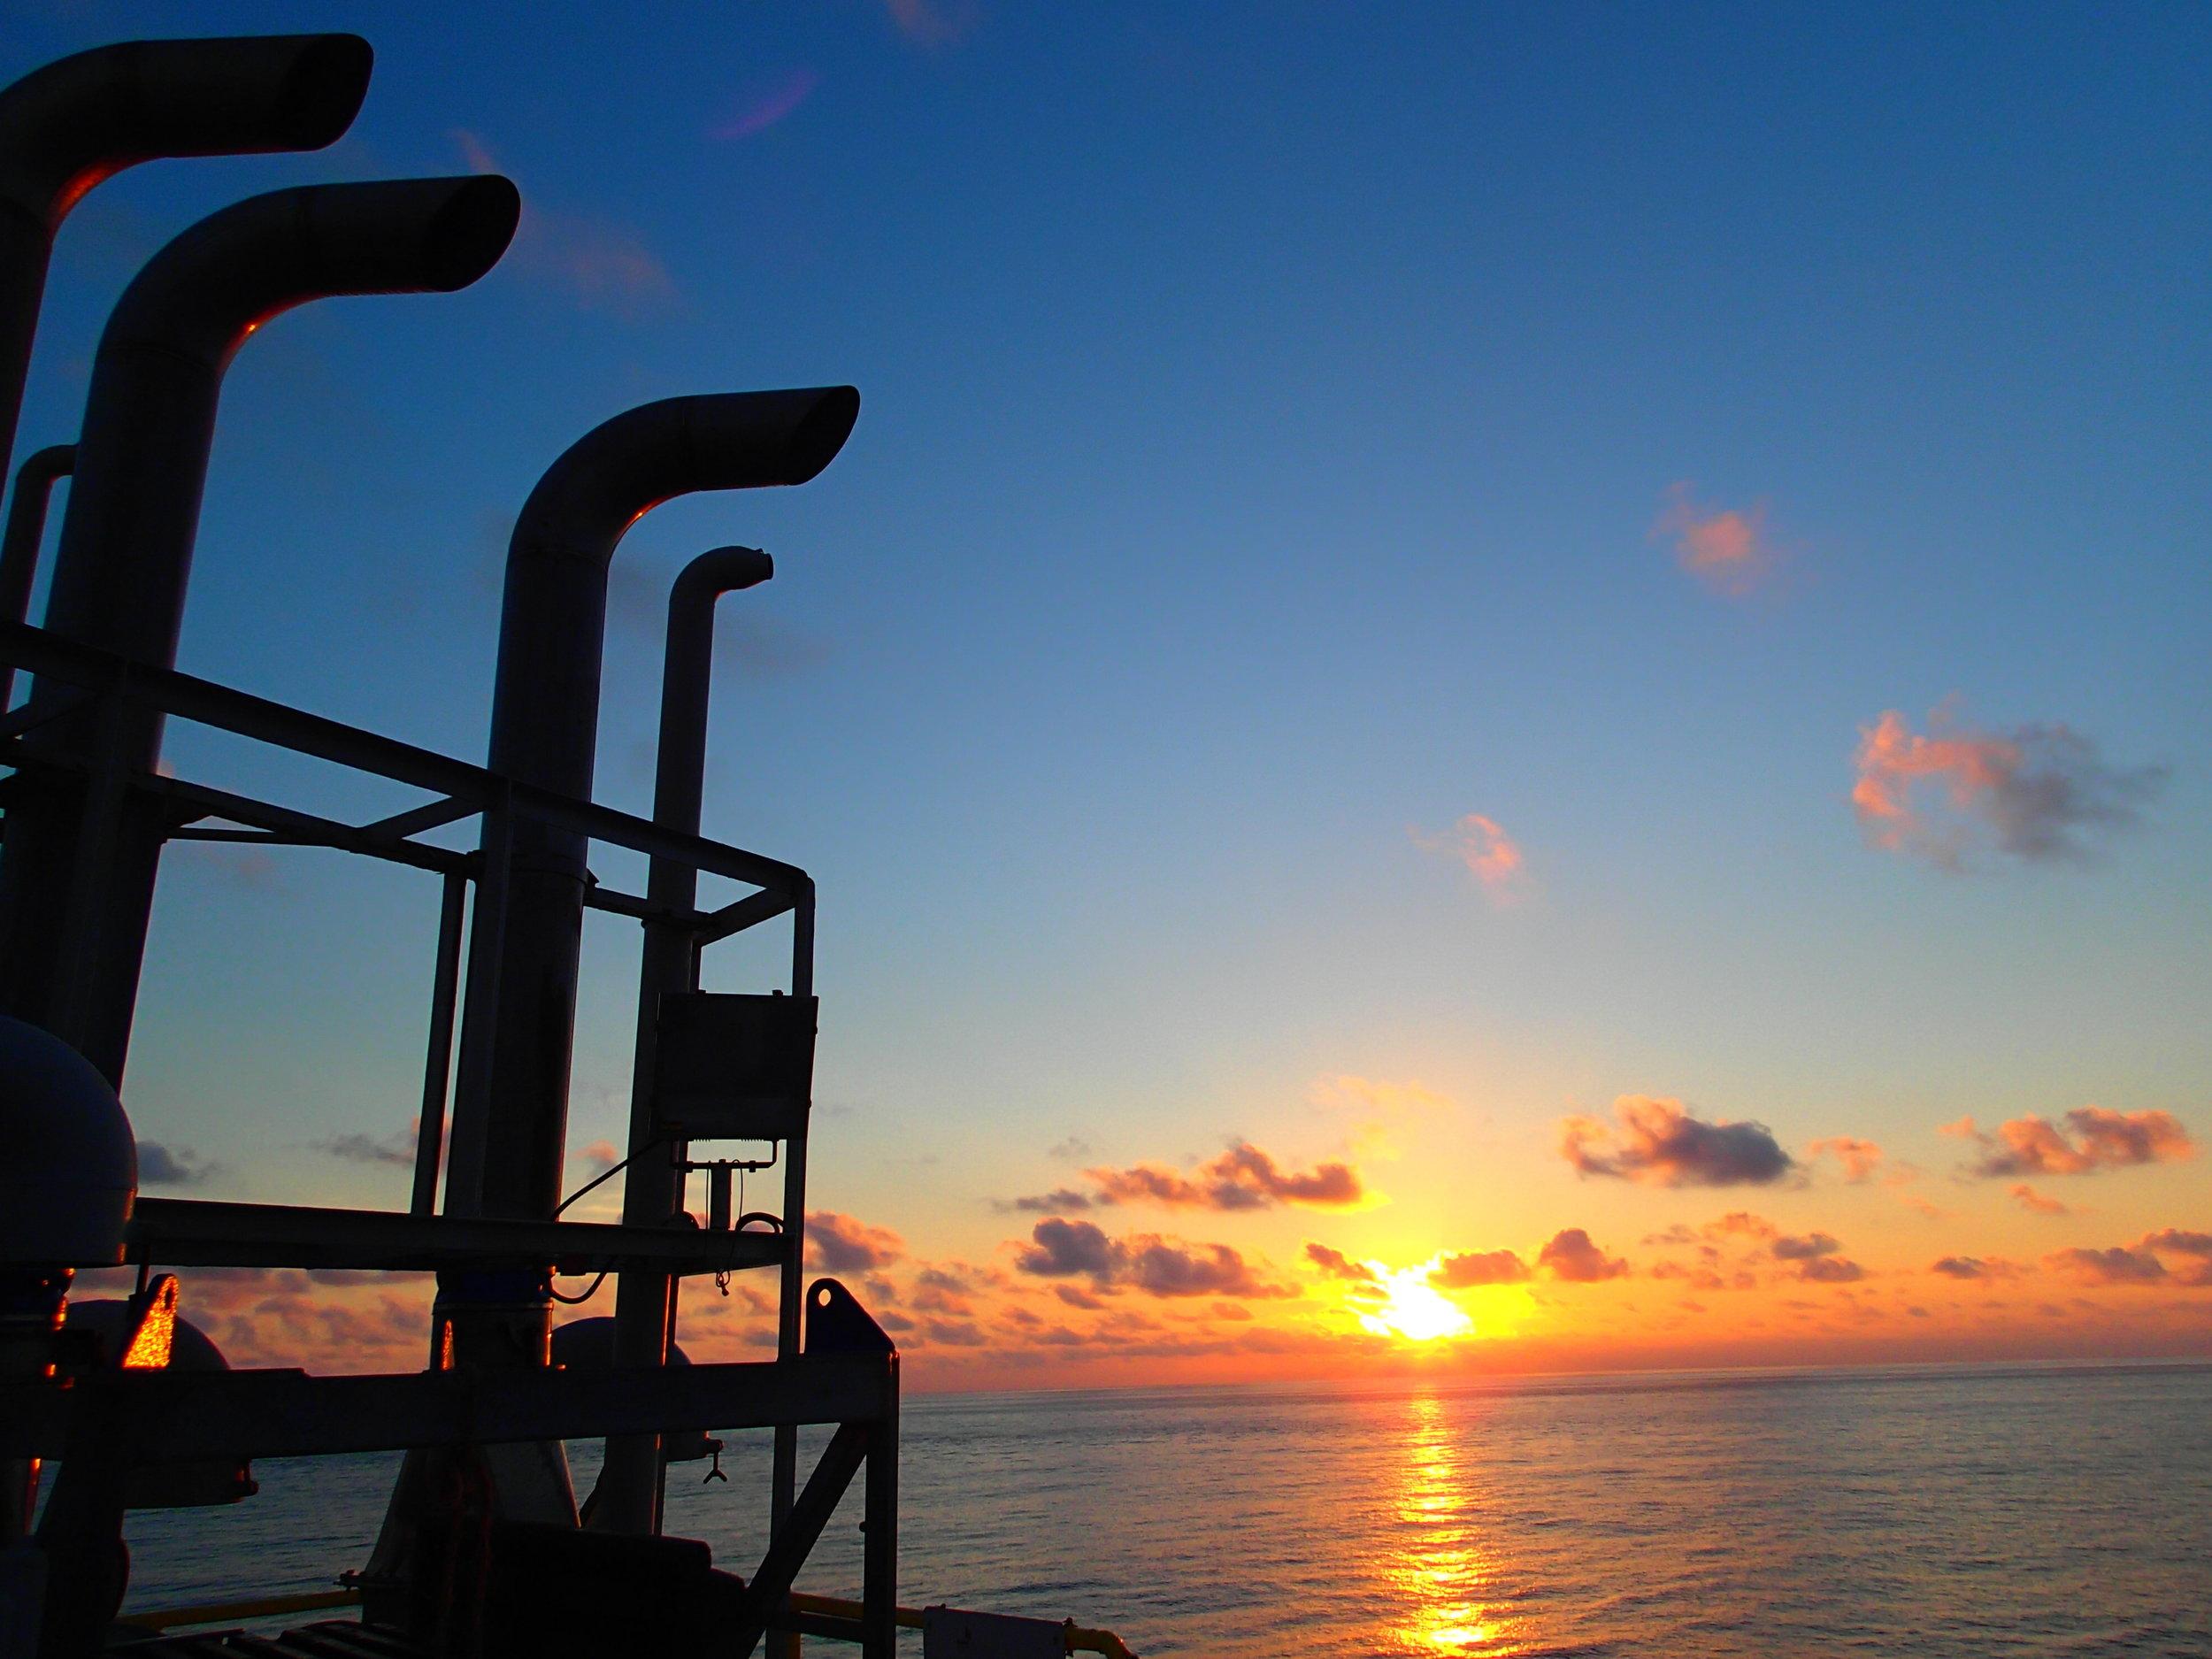 Sunrise view on Joides Resolution. Photo credit: Sandra Herrmann, IODP.